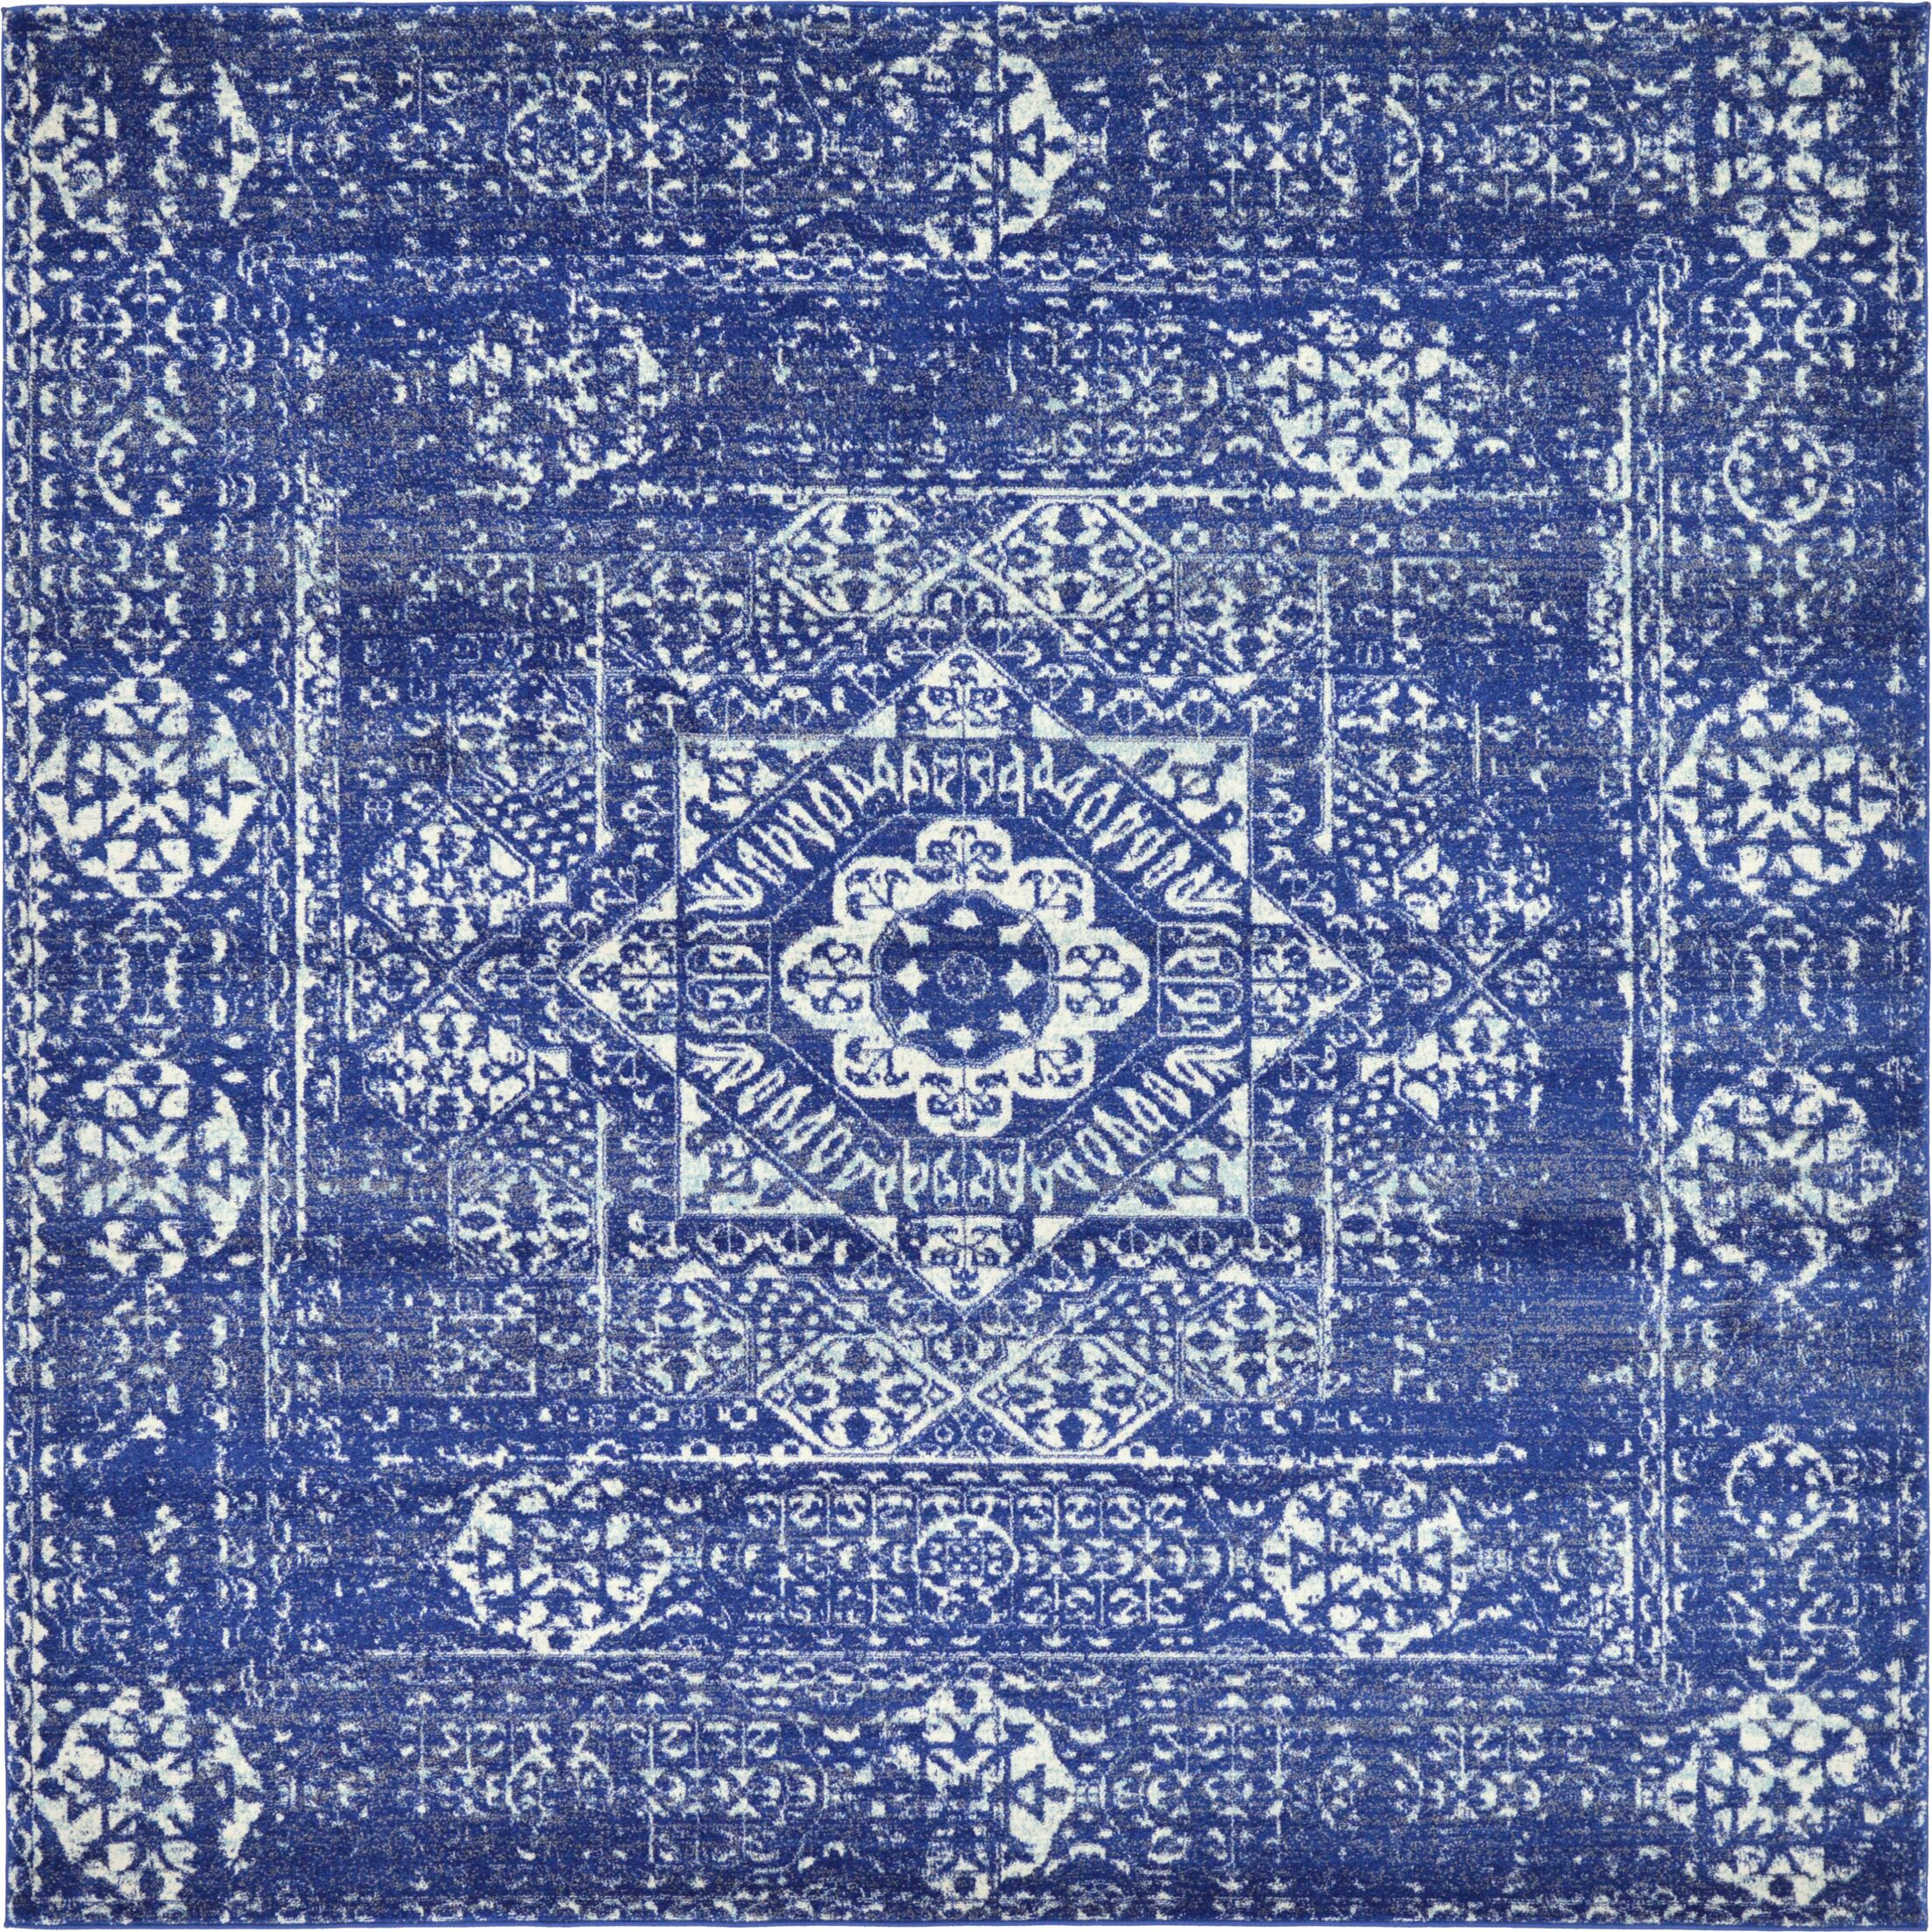 Ove Blue Area Rug Rug Size: Square 8'4